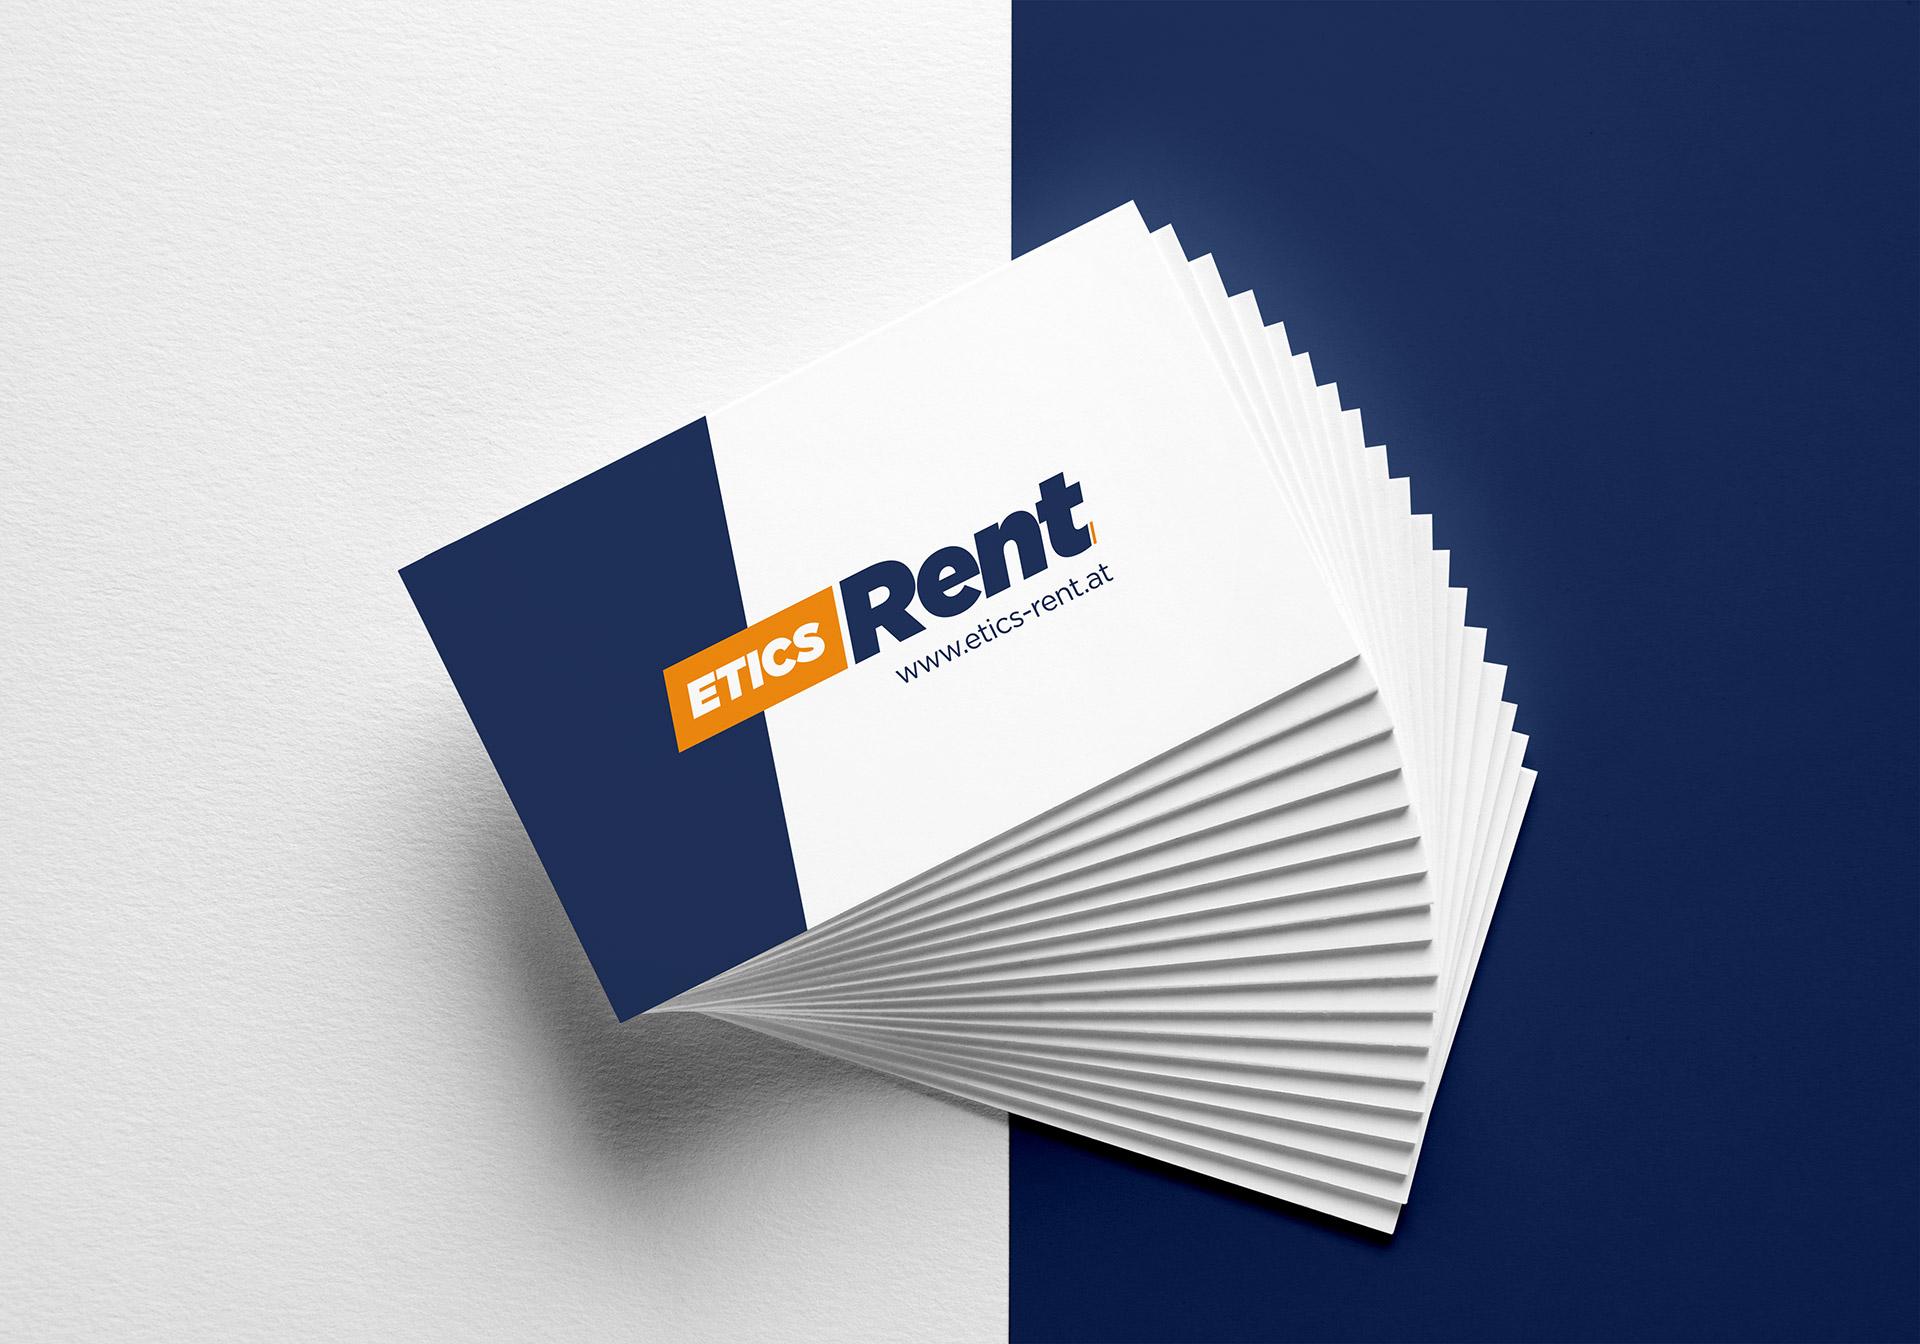 Etics Rent Visitenkarte und Logo